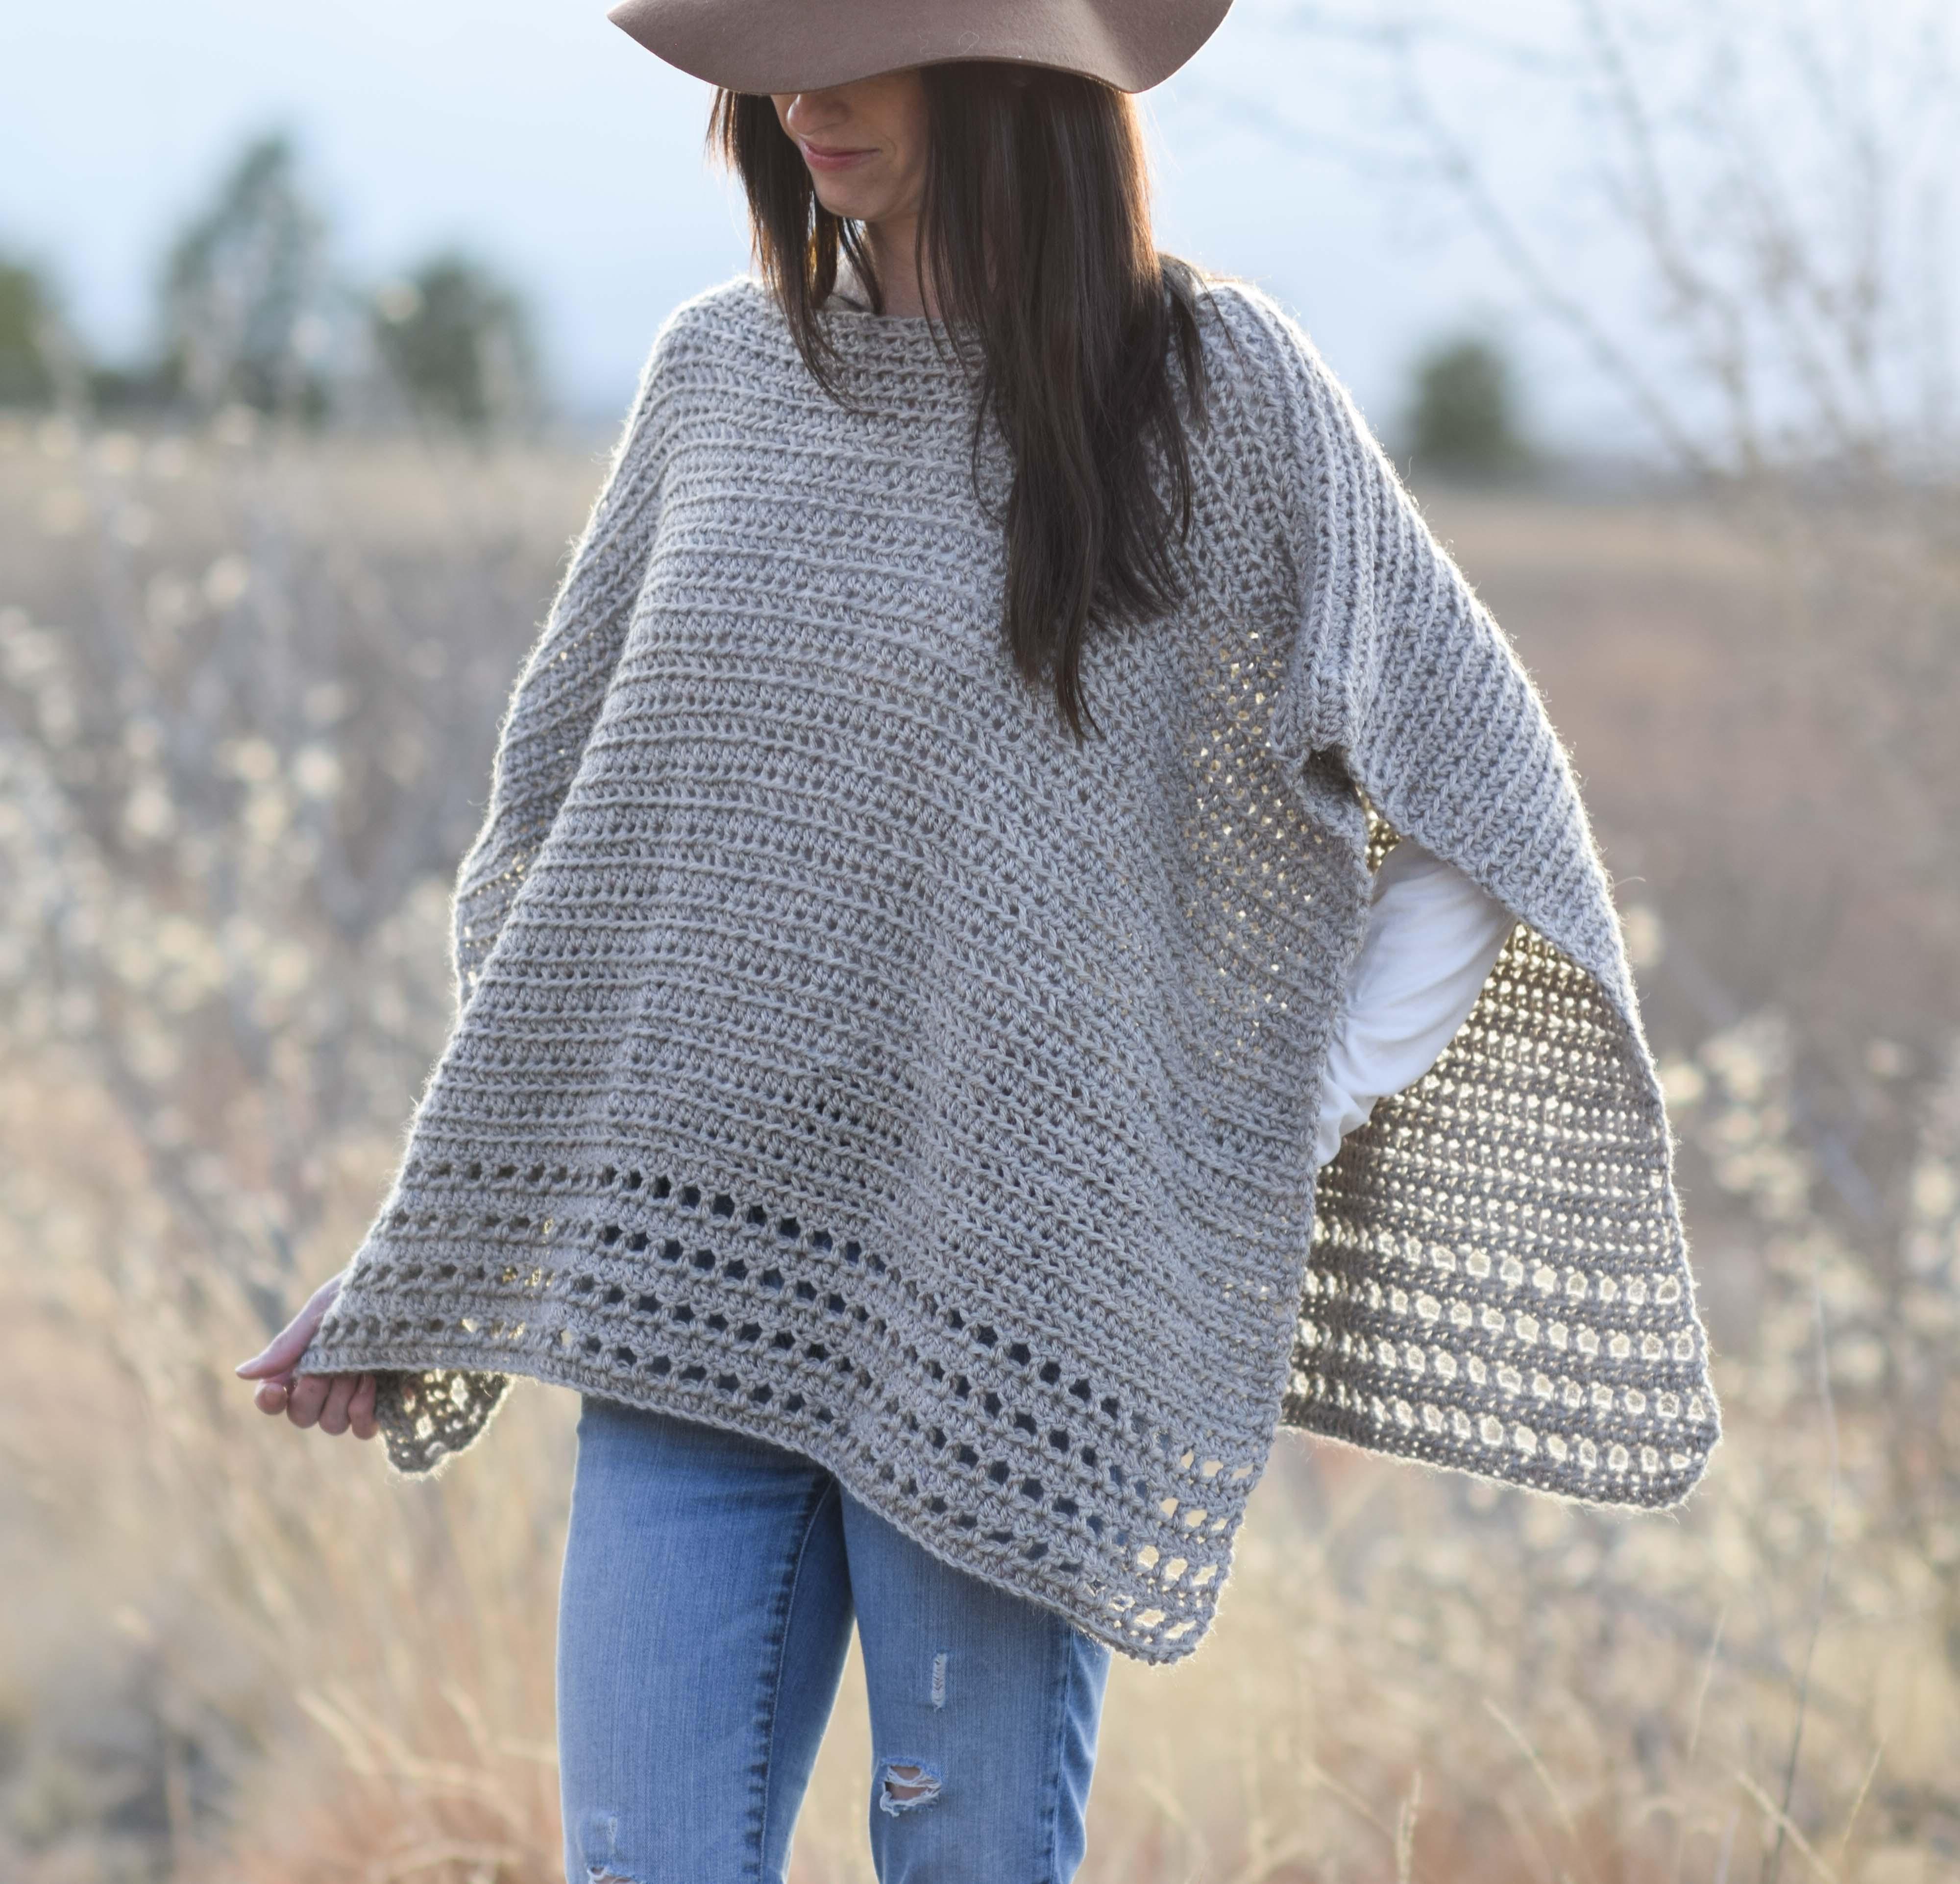 Light Alpaca Poncho Pattern Crochet Kit